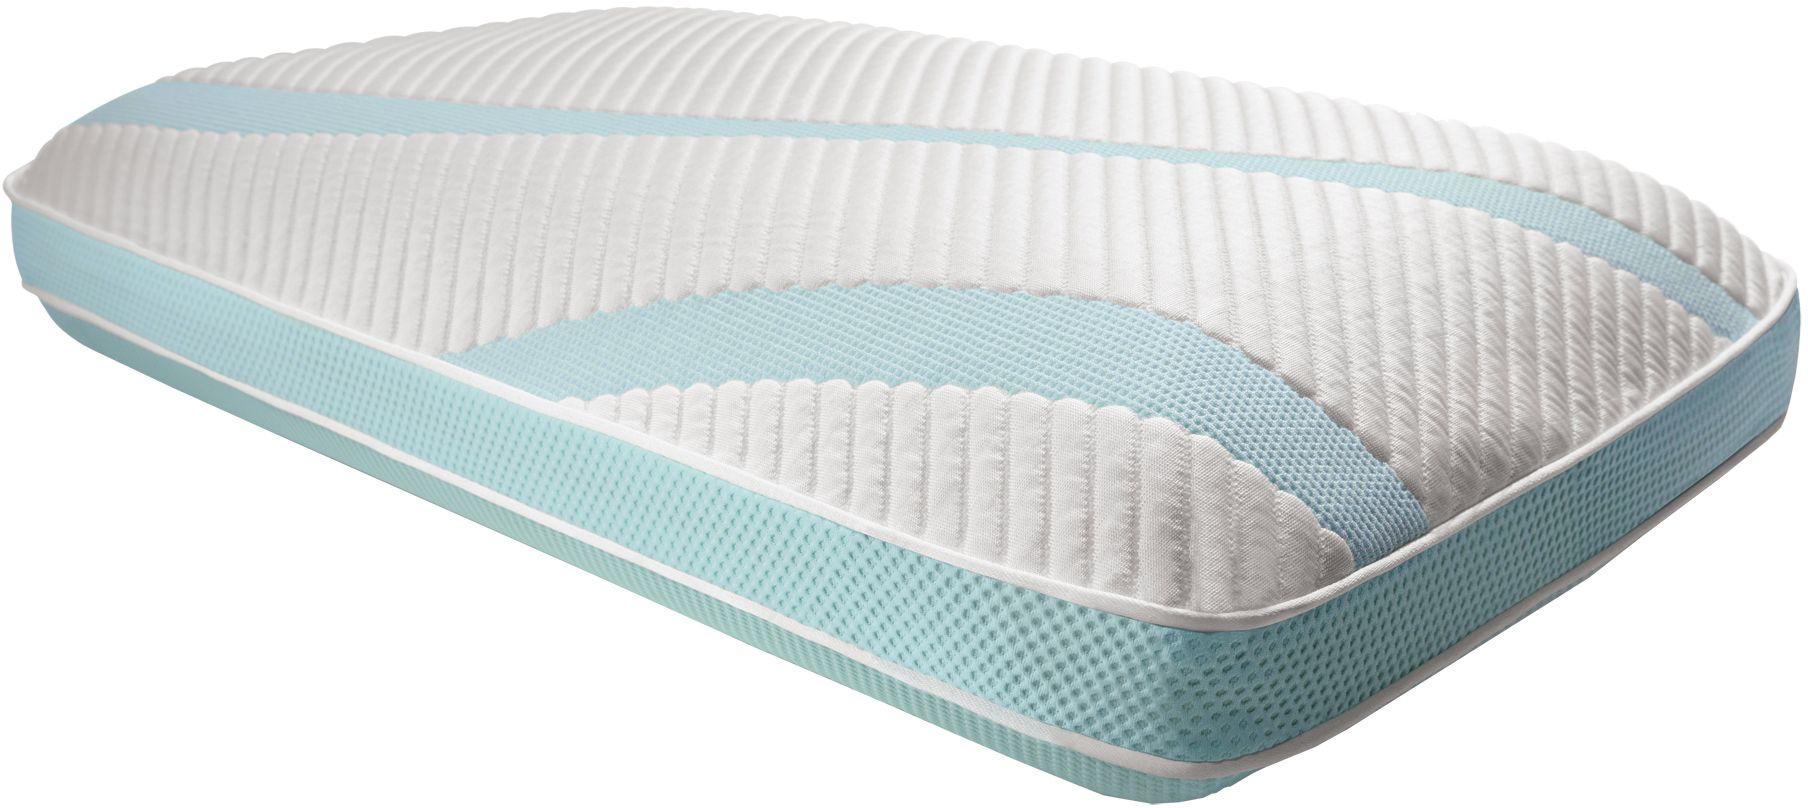 Tempur Pedic 174 Tempur Adapt 174 Prohi Cooling Pillow 153731